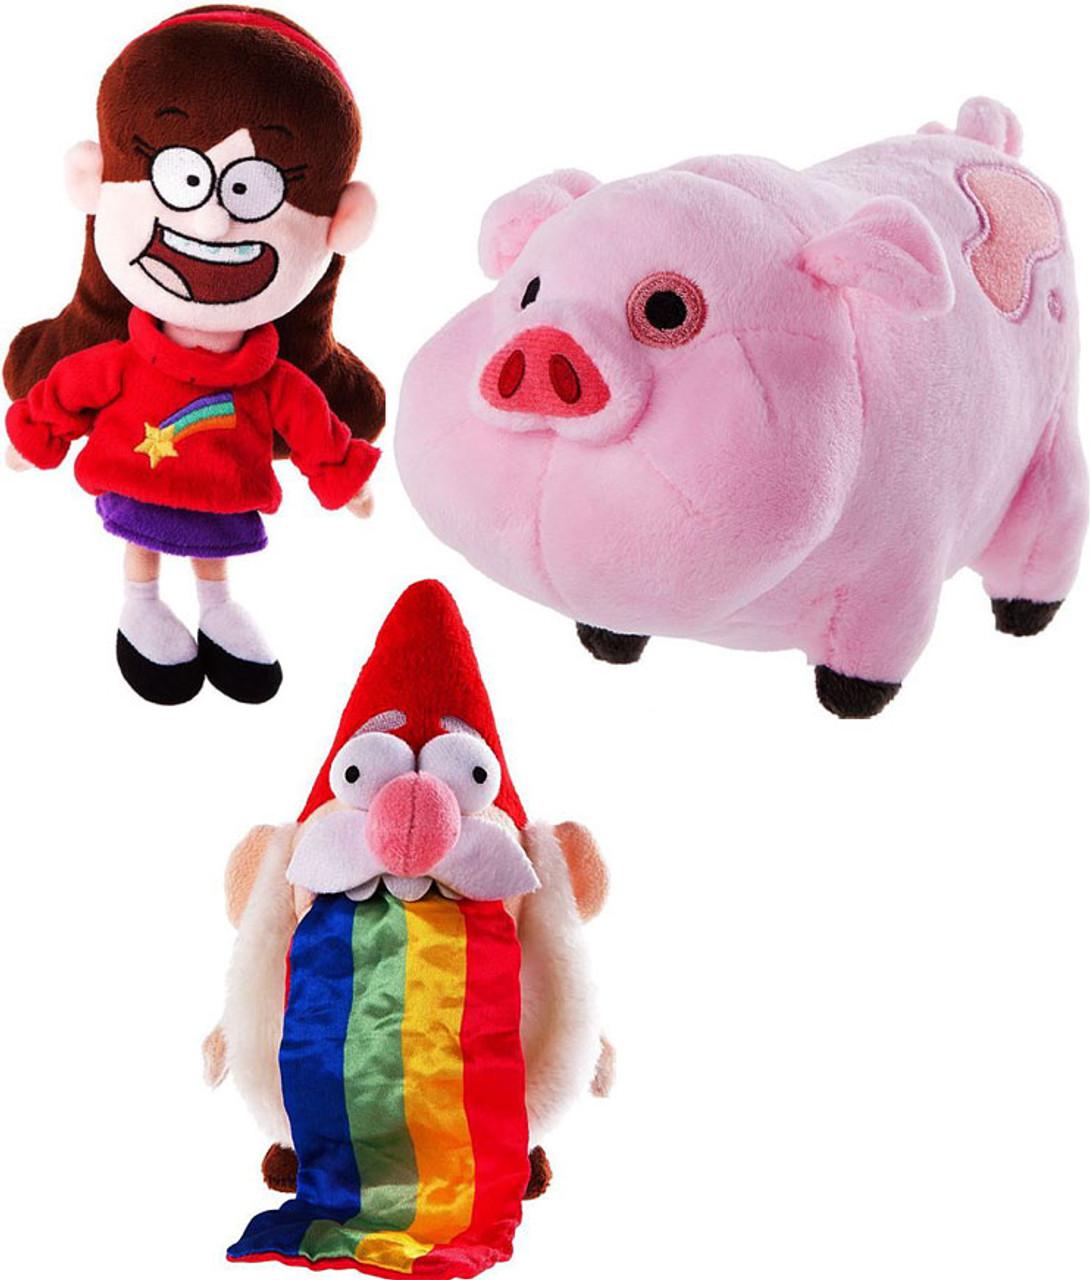 Disney Gravity Falls Barfing Gnome, Mabel & Waddles Set of 3 Plush Dolls